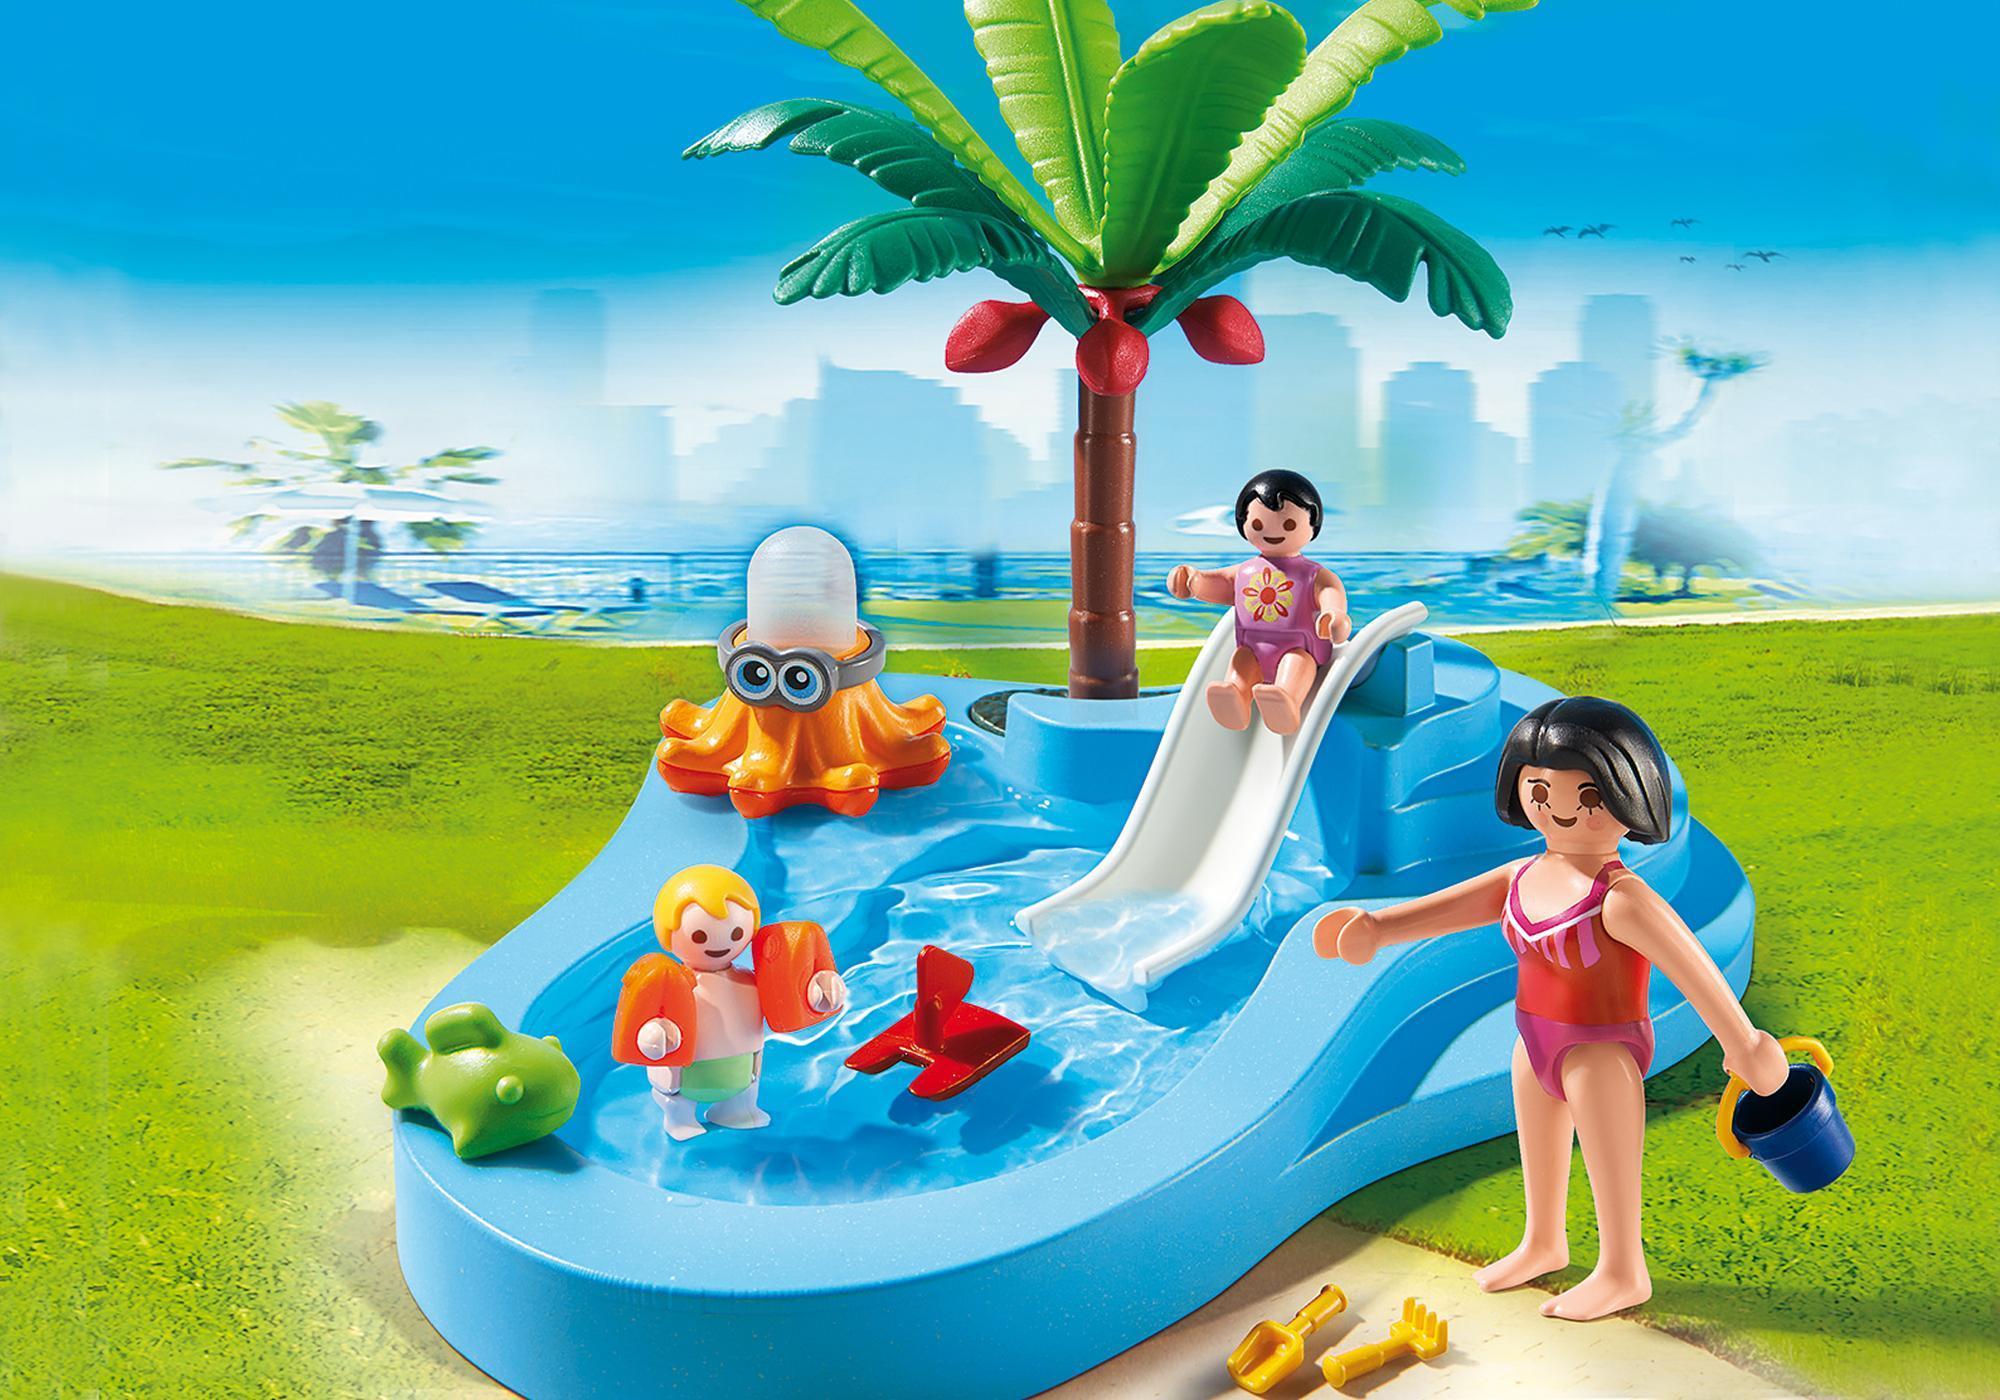 http://media.playmobil.com/i/playmobil/6673_product_detail/Piscina para Bebés com Escorrega